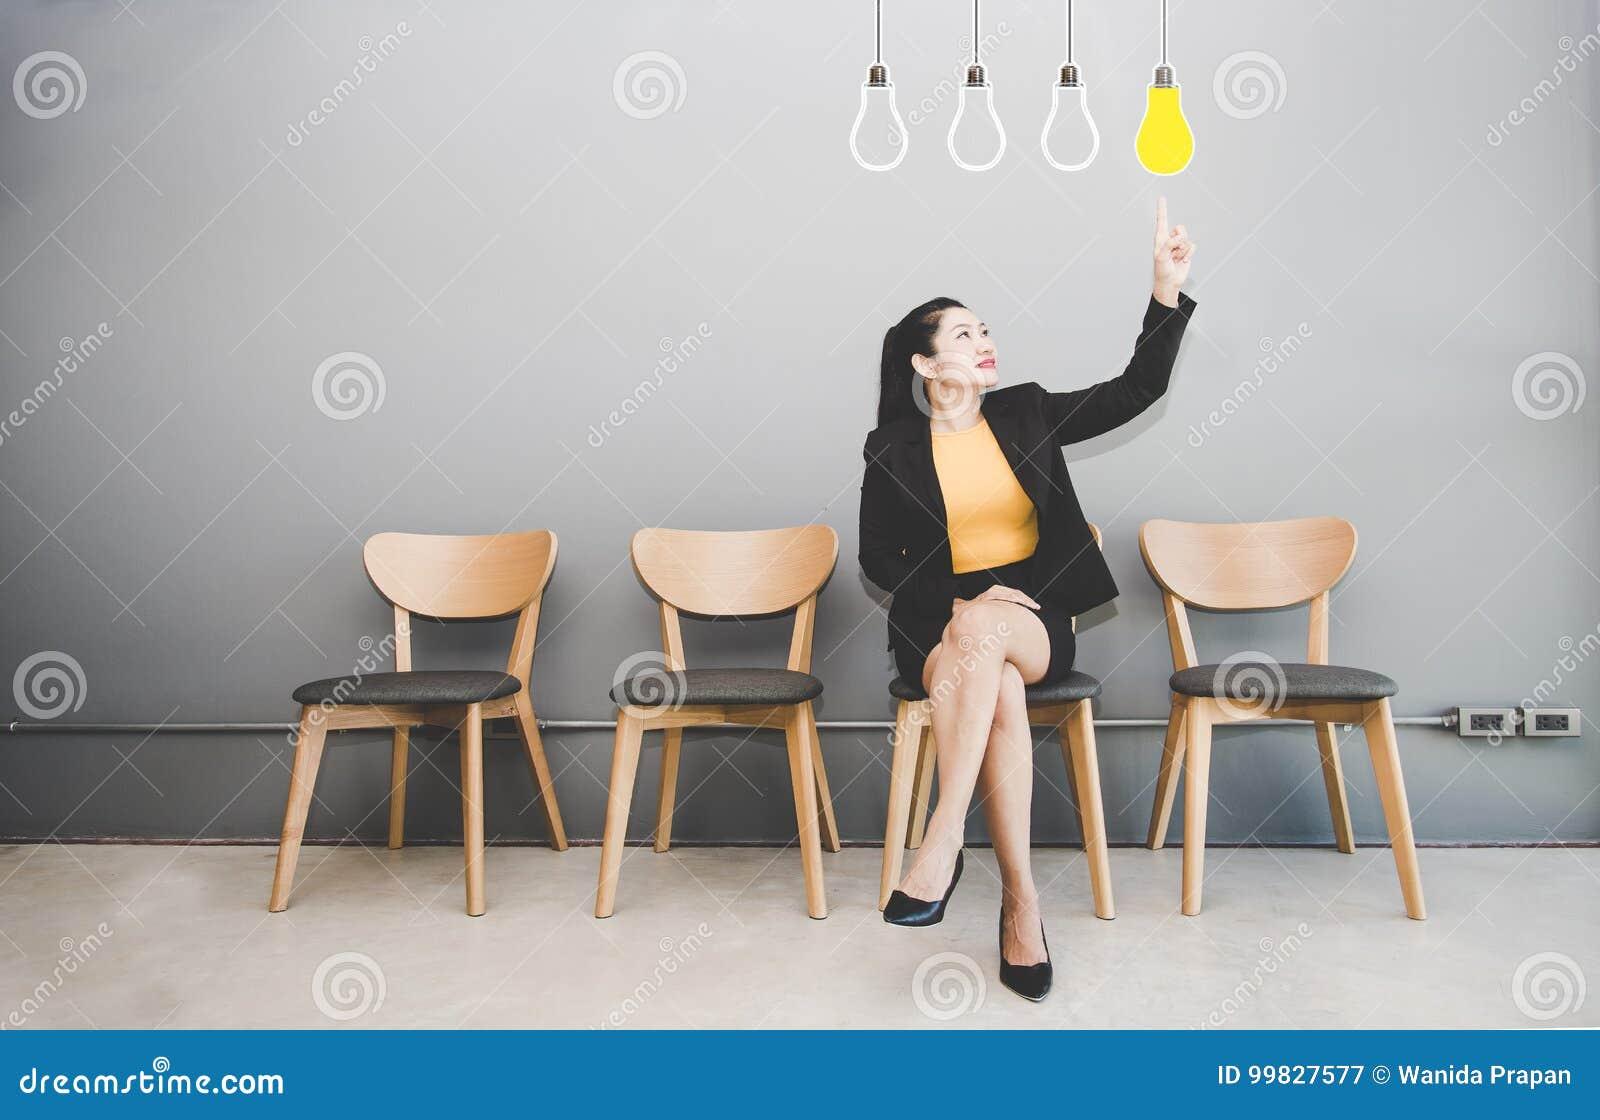 Business women Touching Innovation